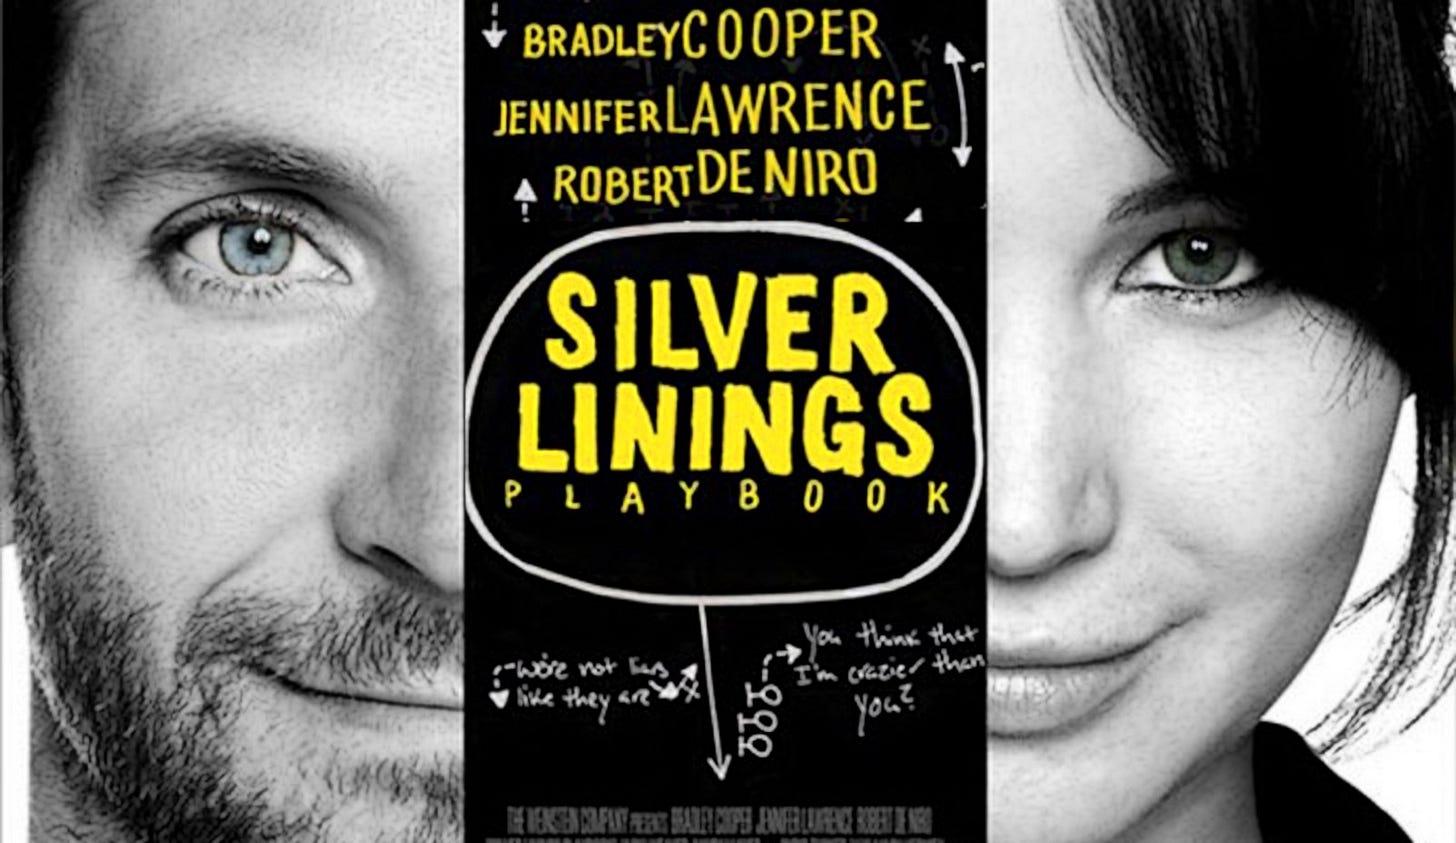 Bradley Cooper Jennifer Lawrence silver linings playbook